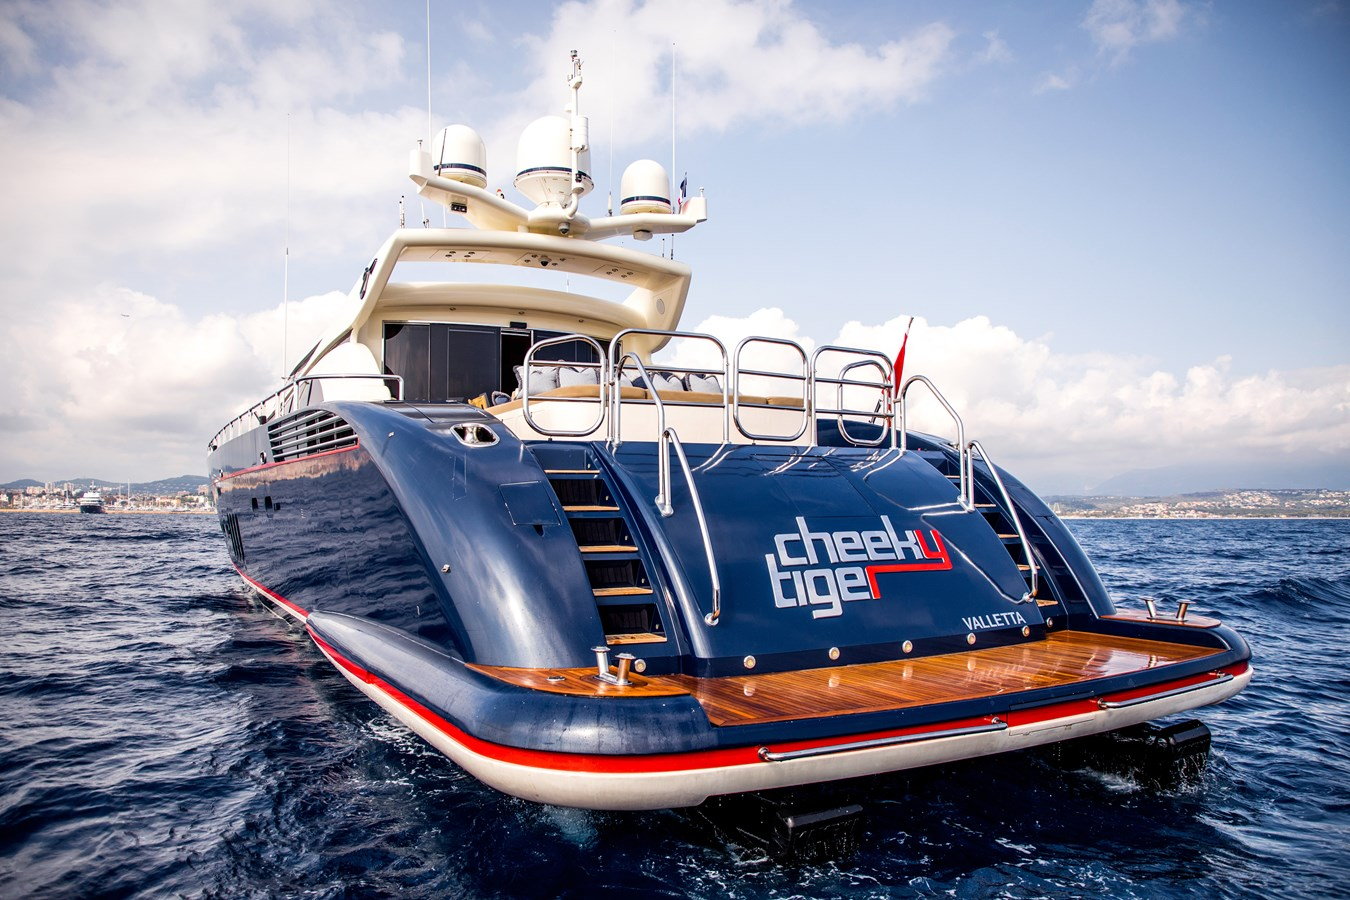 Cheeky-Tiger-Luxury-Yacht-24